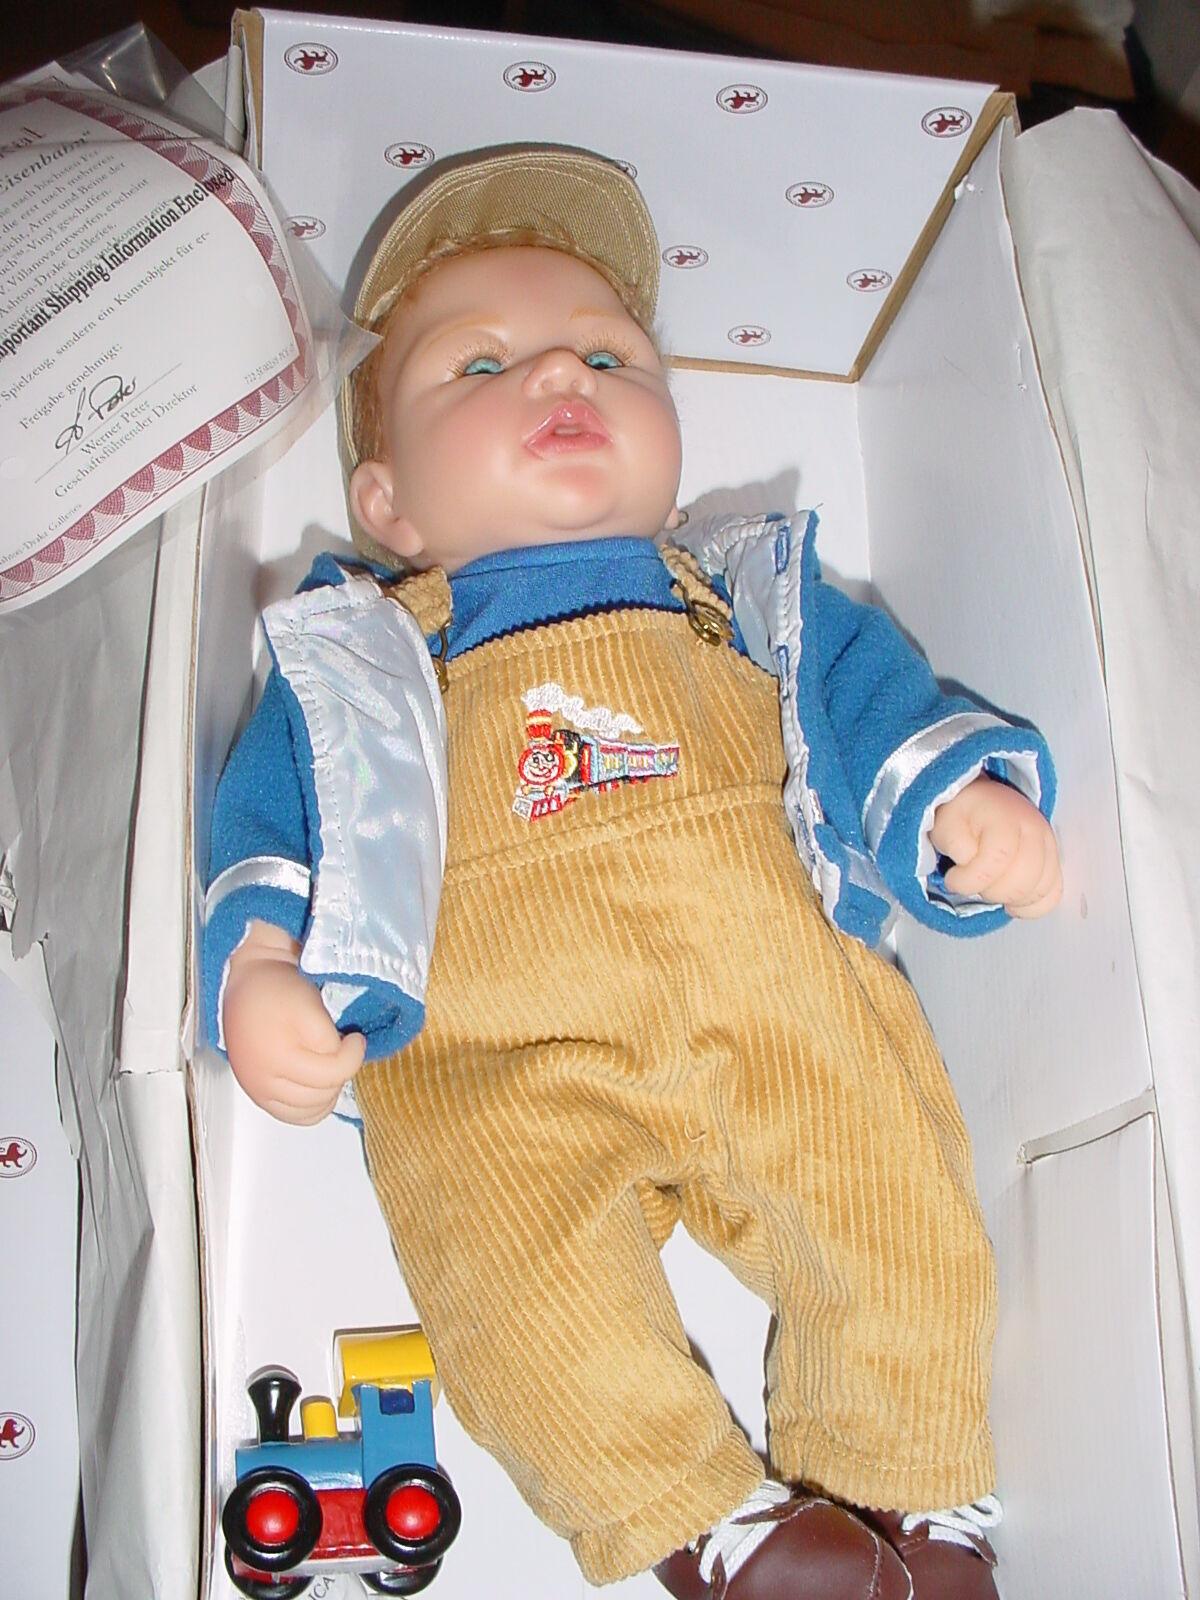 Kevin schöne Puppe wie neu aus Sammlung Bradford Künstlerin Maribel V. Villanova